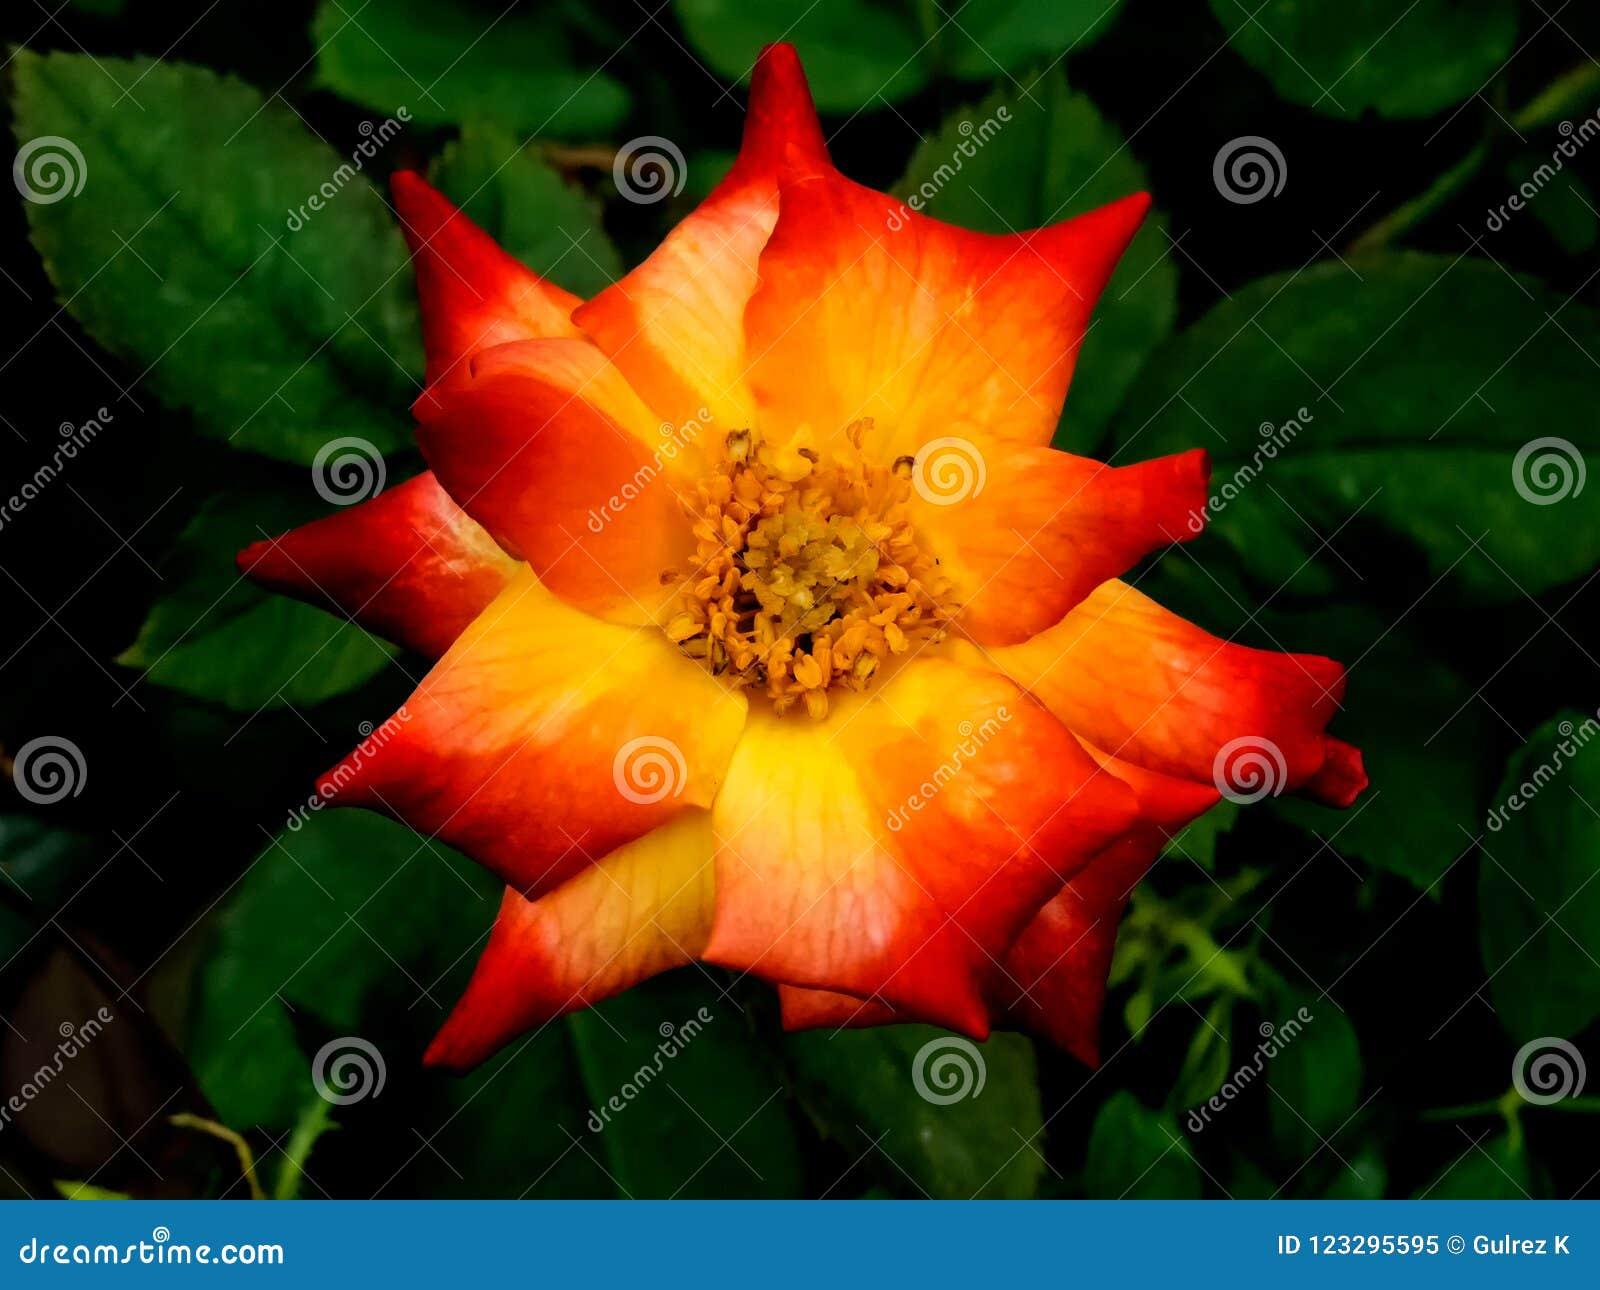 Closeup of a Orange/Yellow Rose